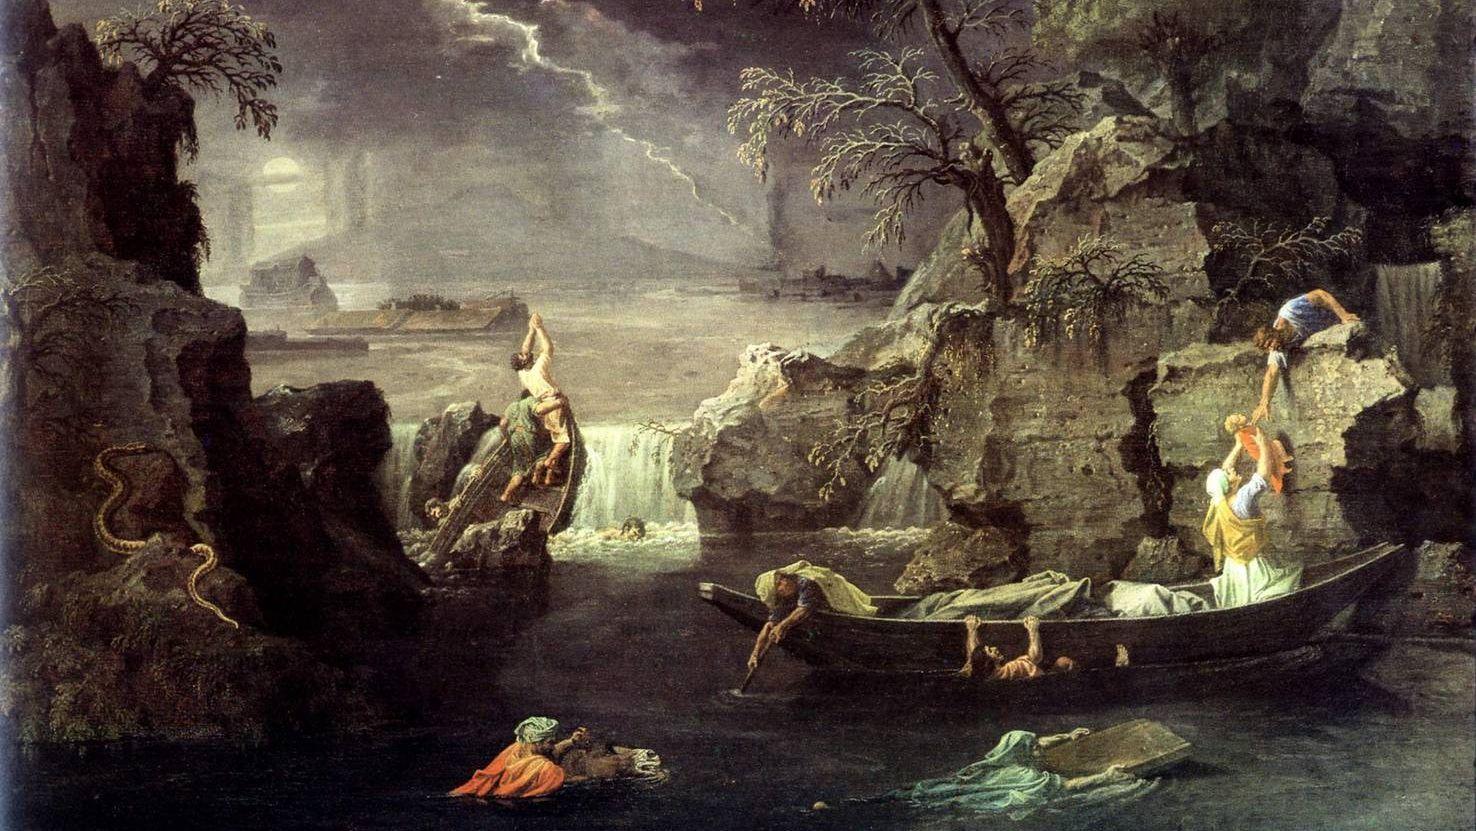 Зима, или Потоп. Никола Пуссен. 1665